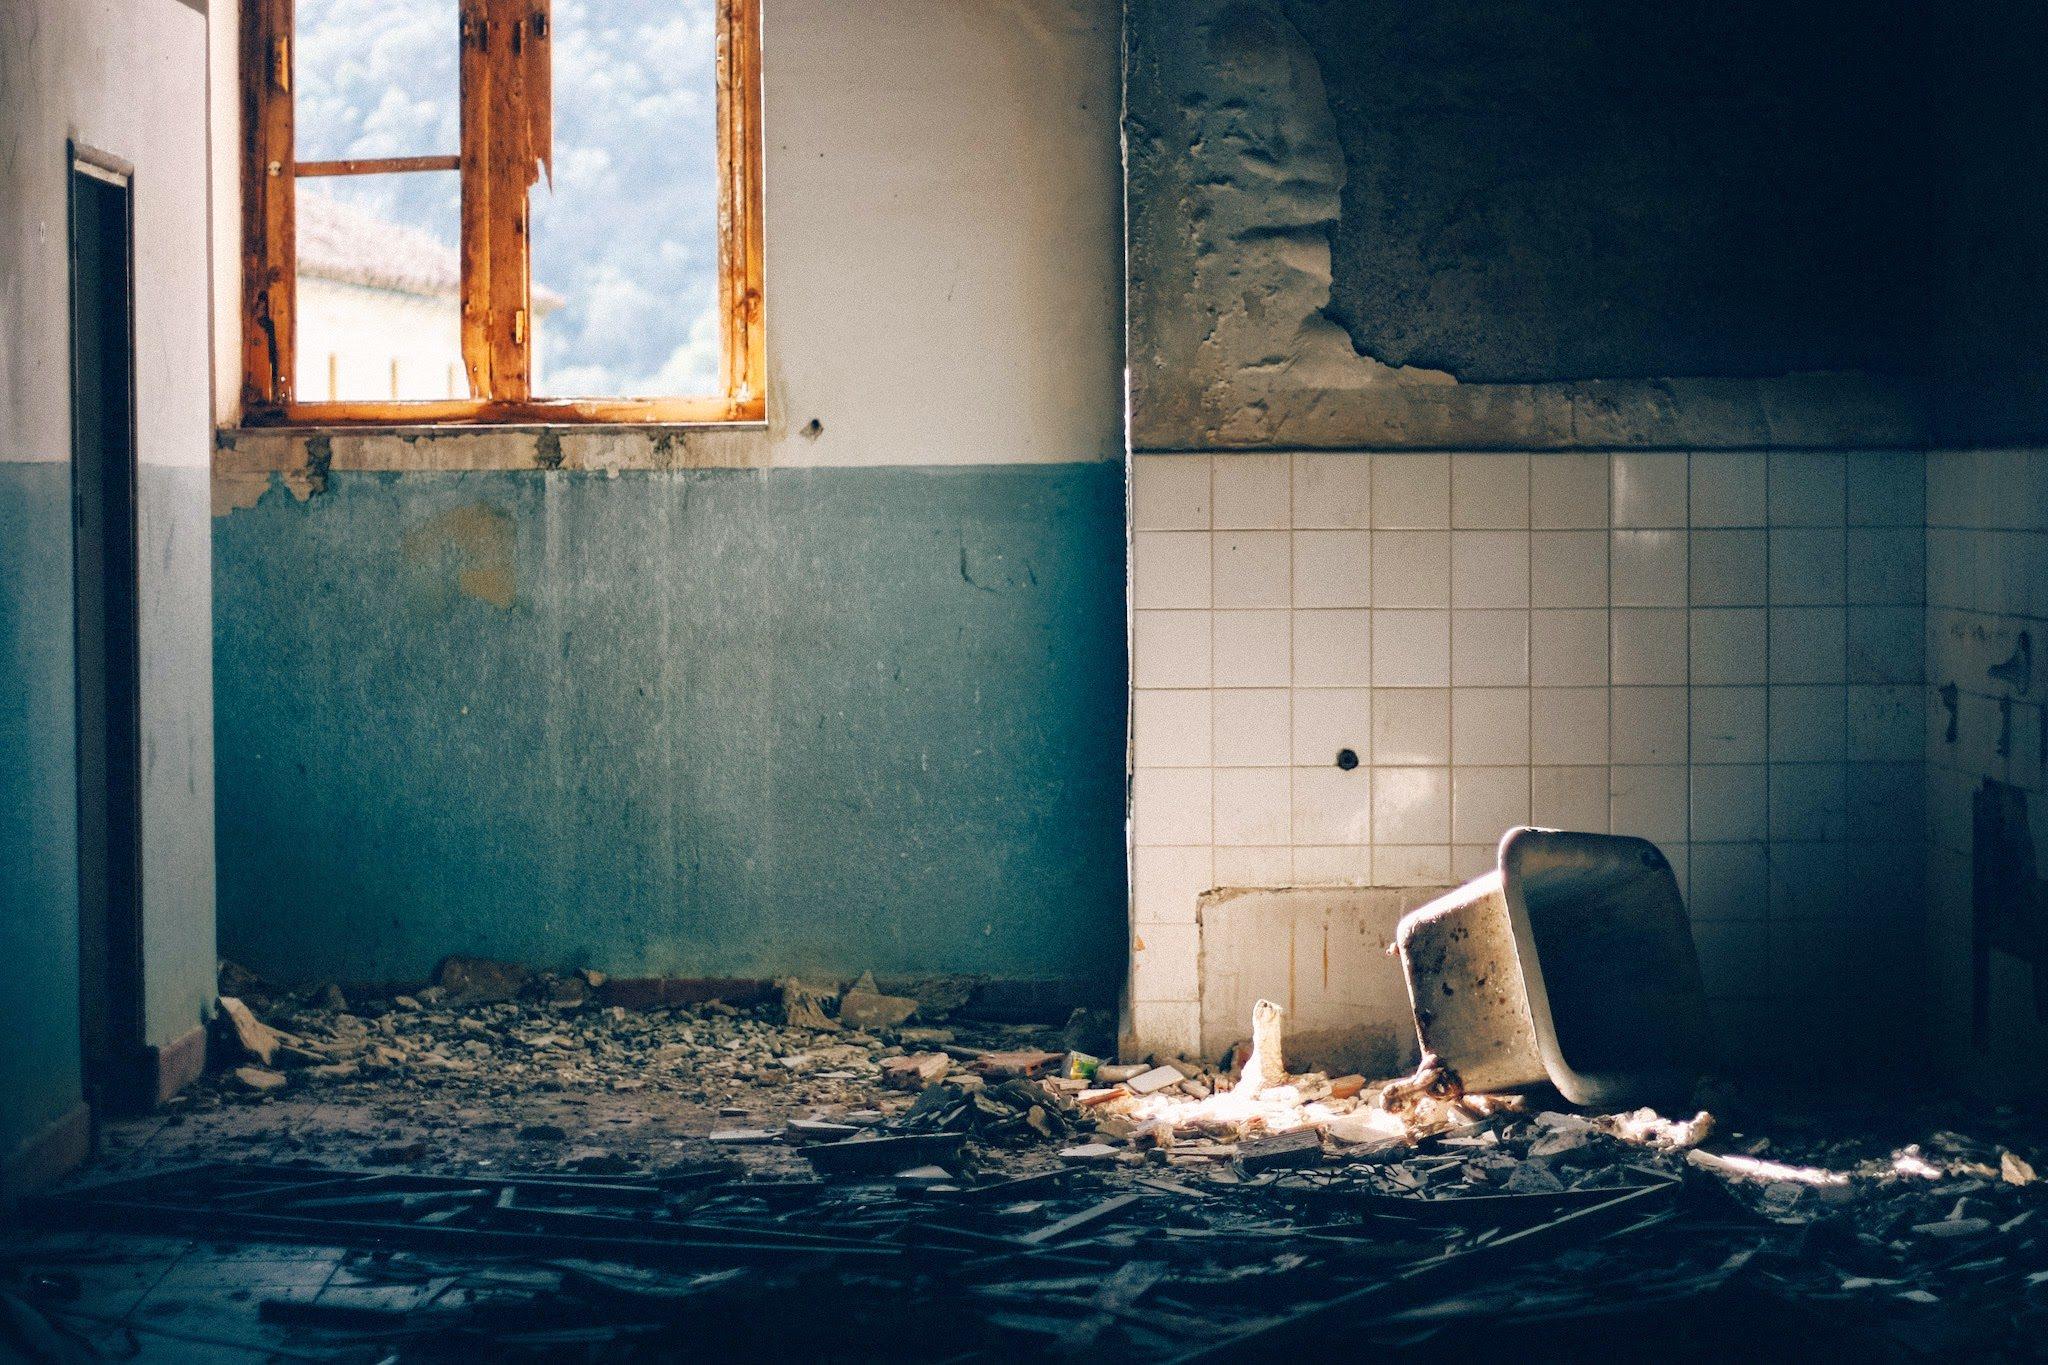 Neglected, rusty, falling apart